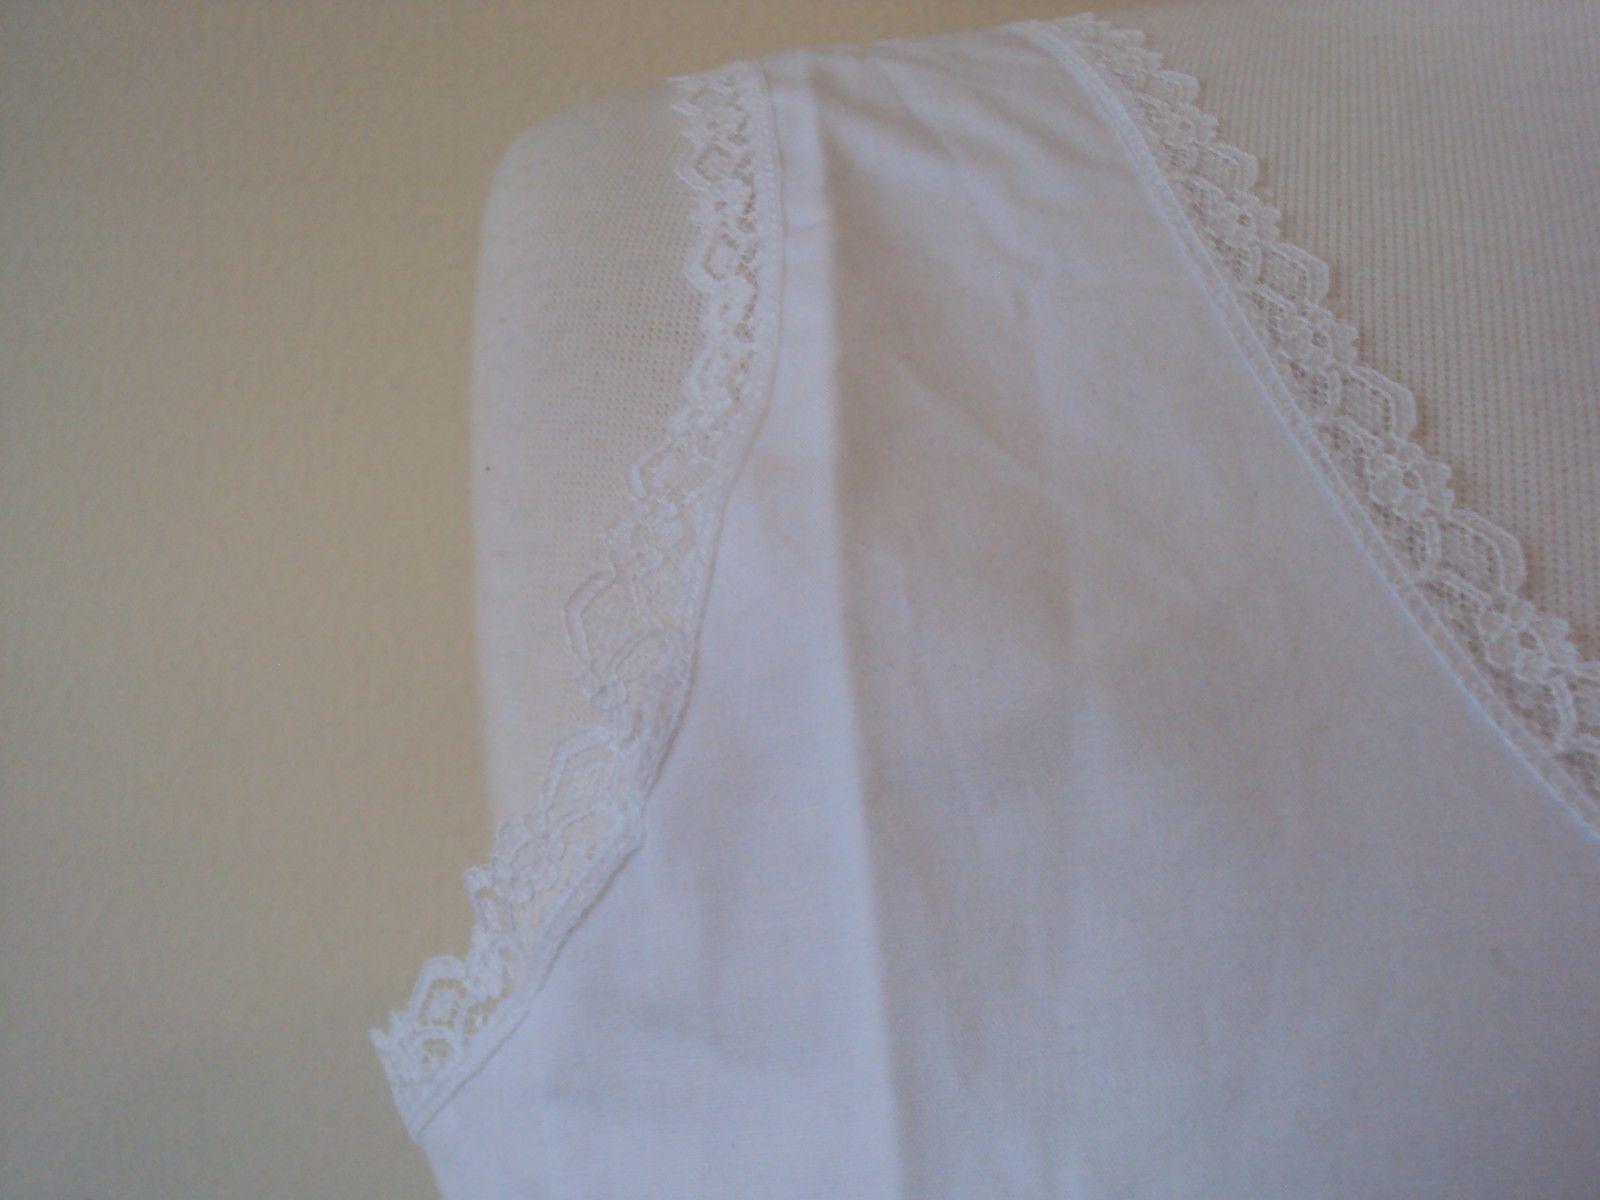 Velrose Lingerie Cool Cotton Cotton Full Slips White Style 801 size 36-54 image 3